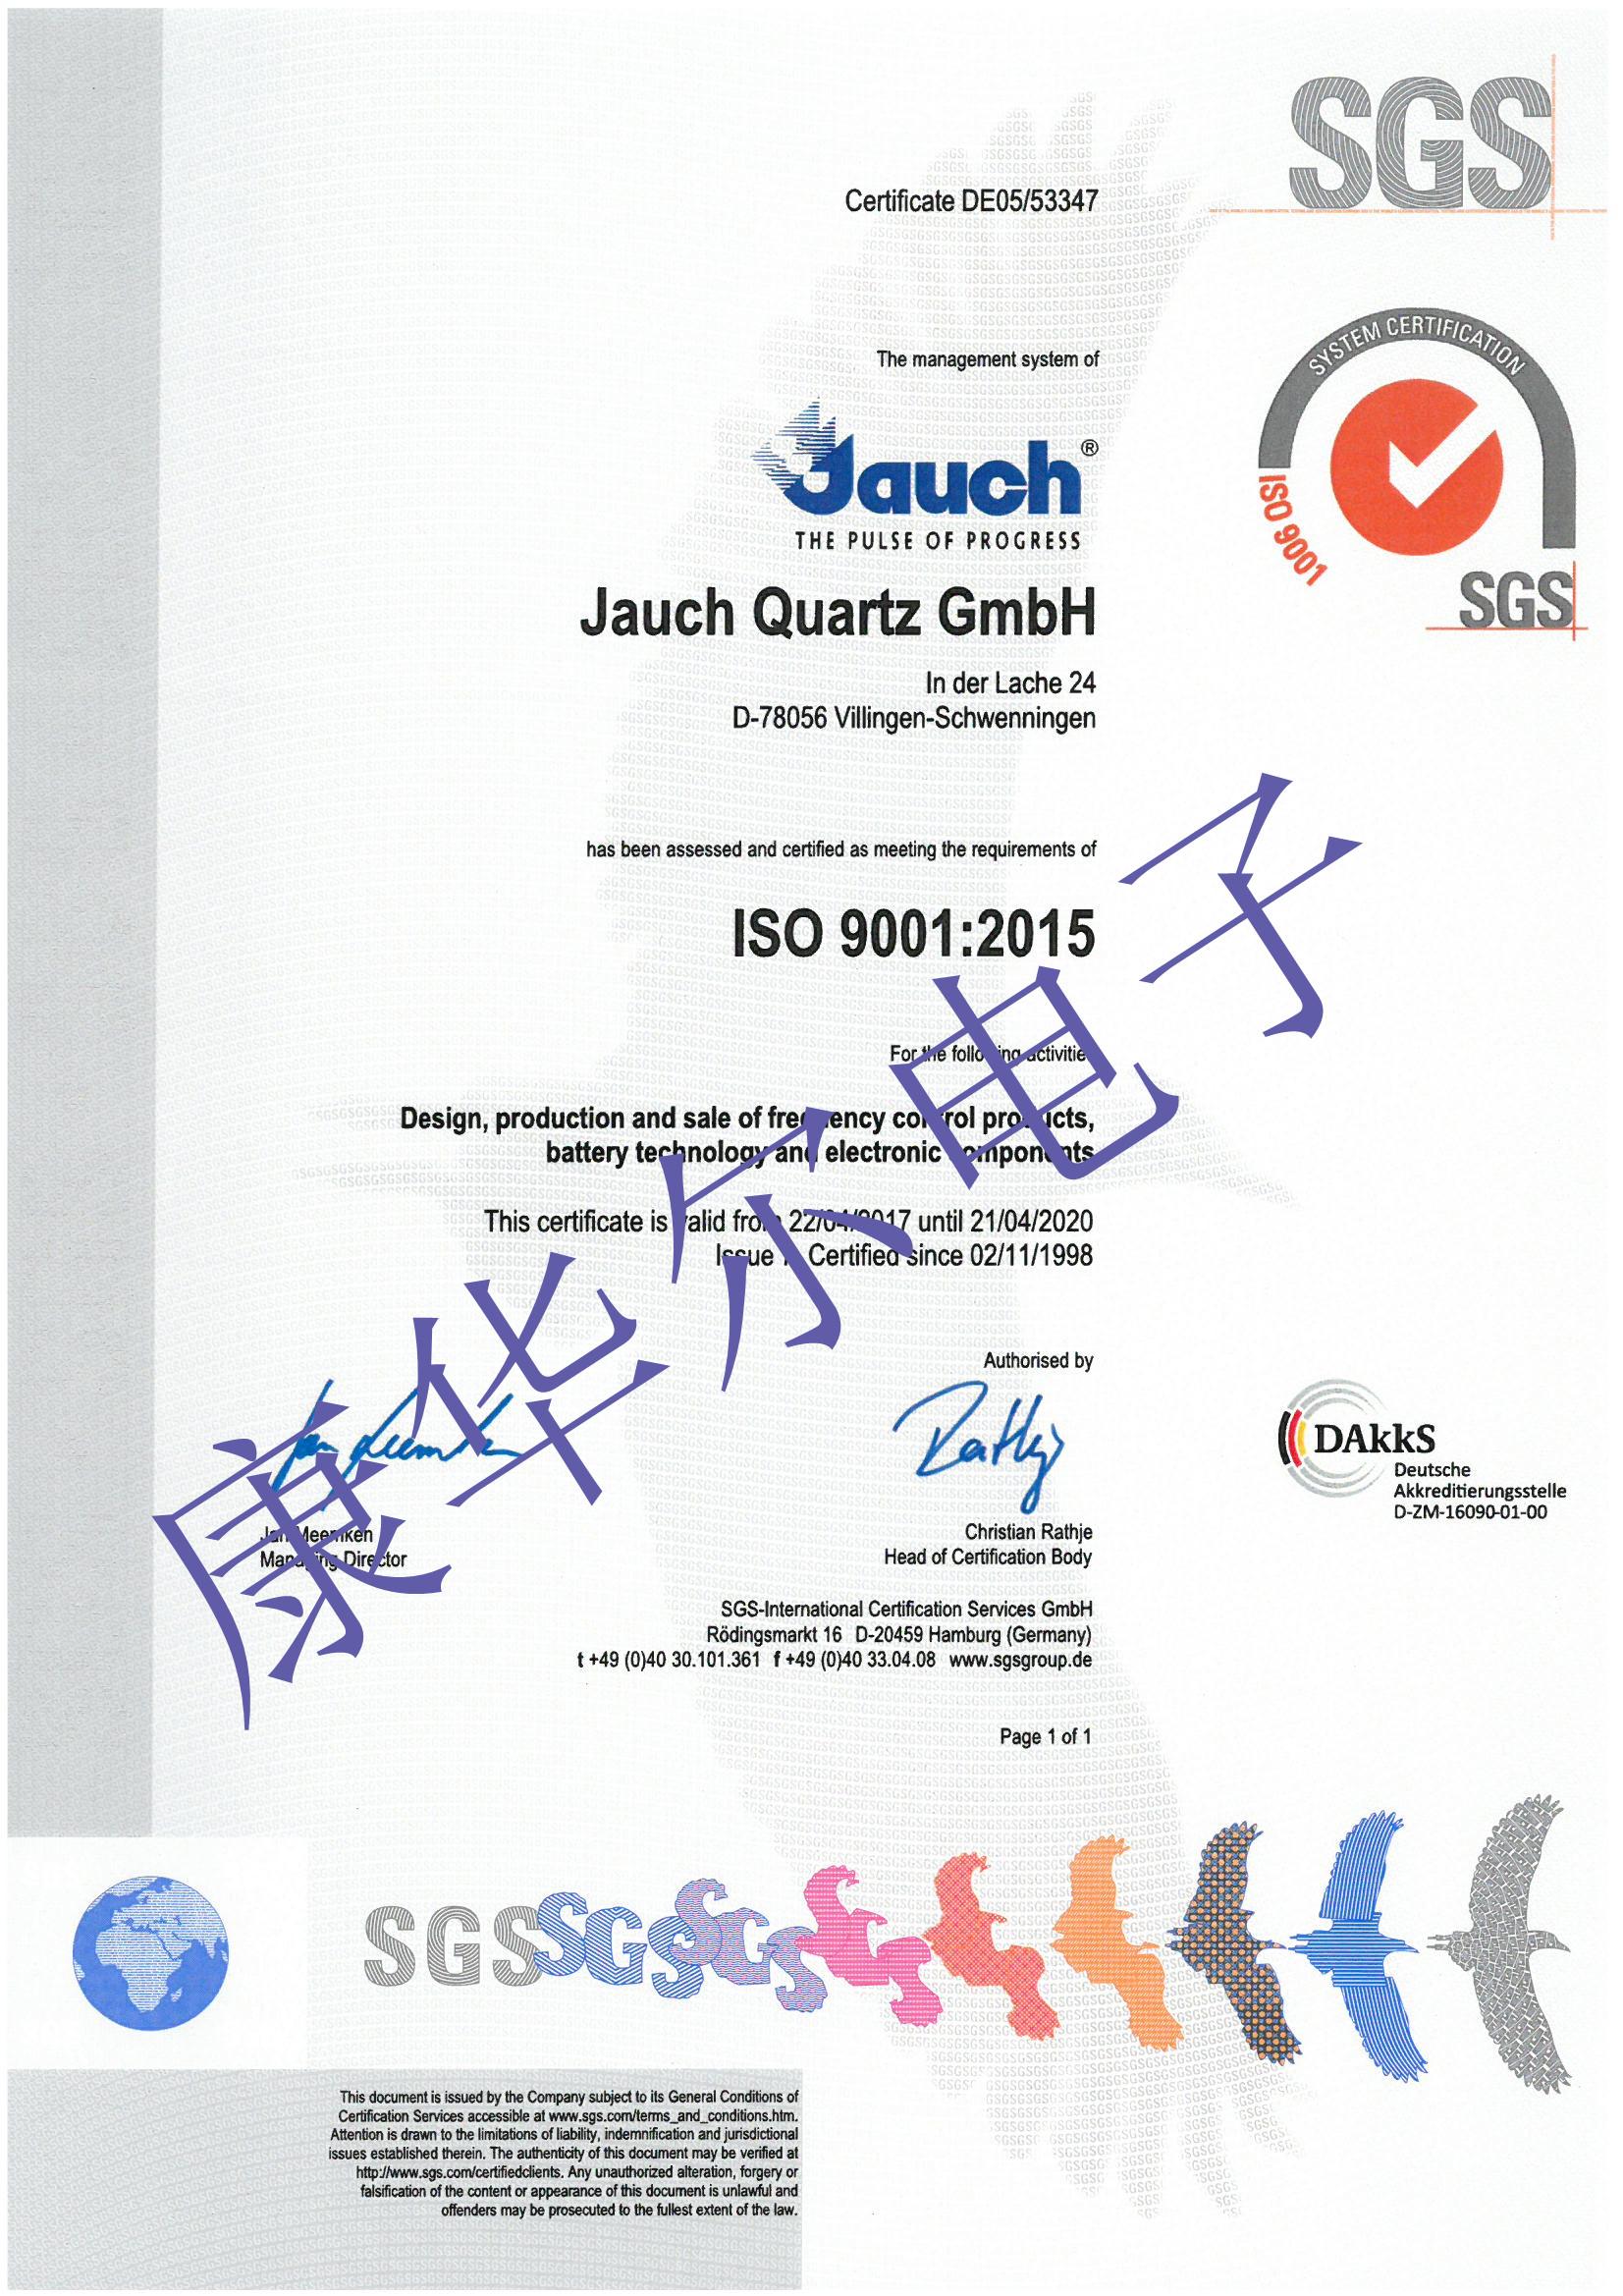 Jauch公司的质量管理行为准则